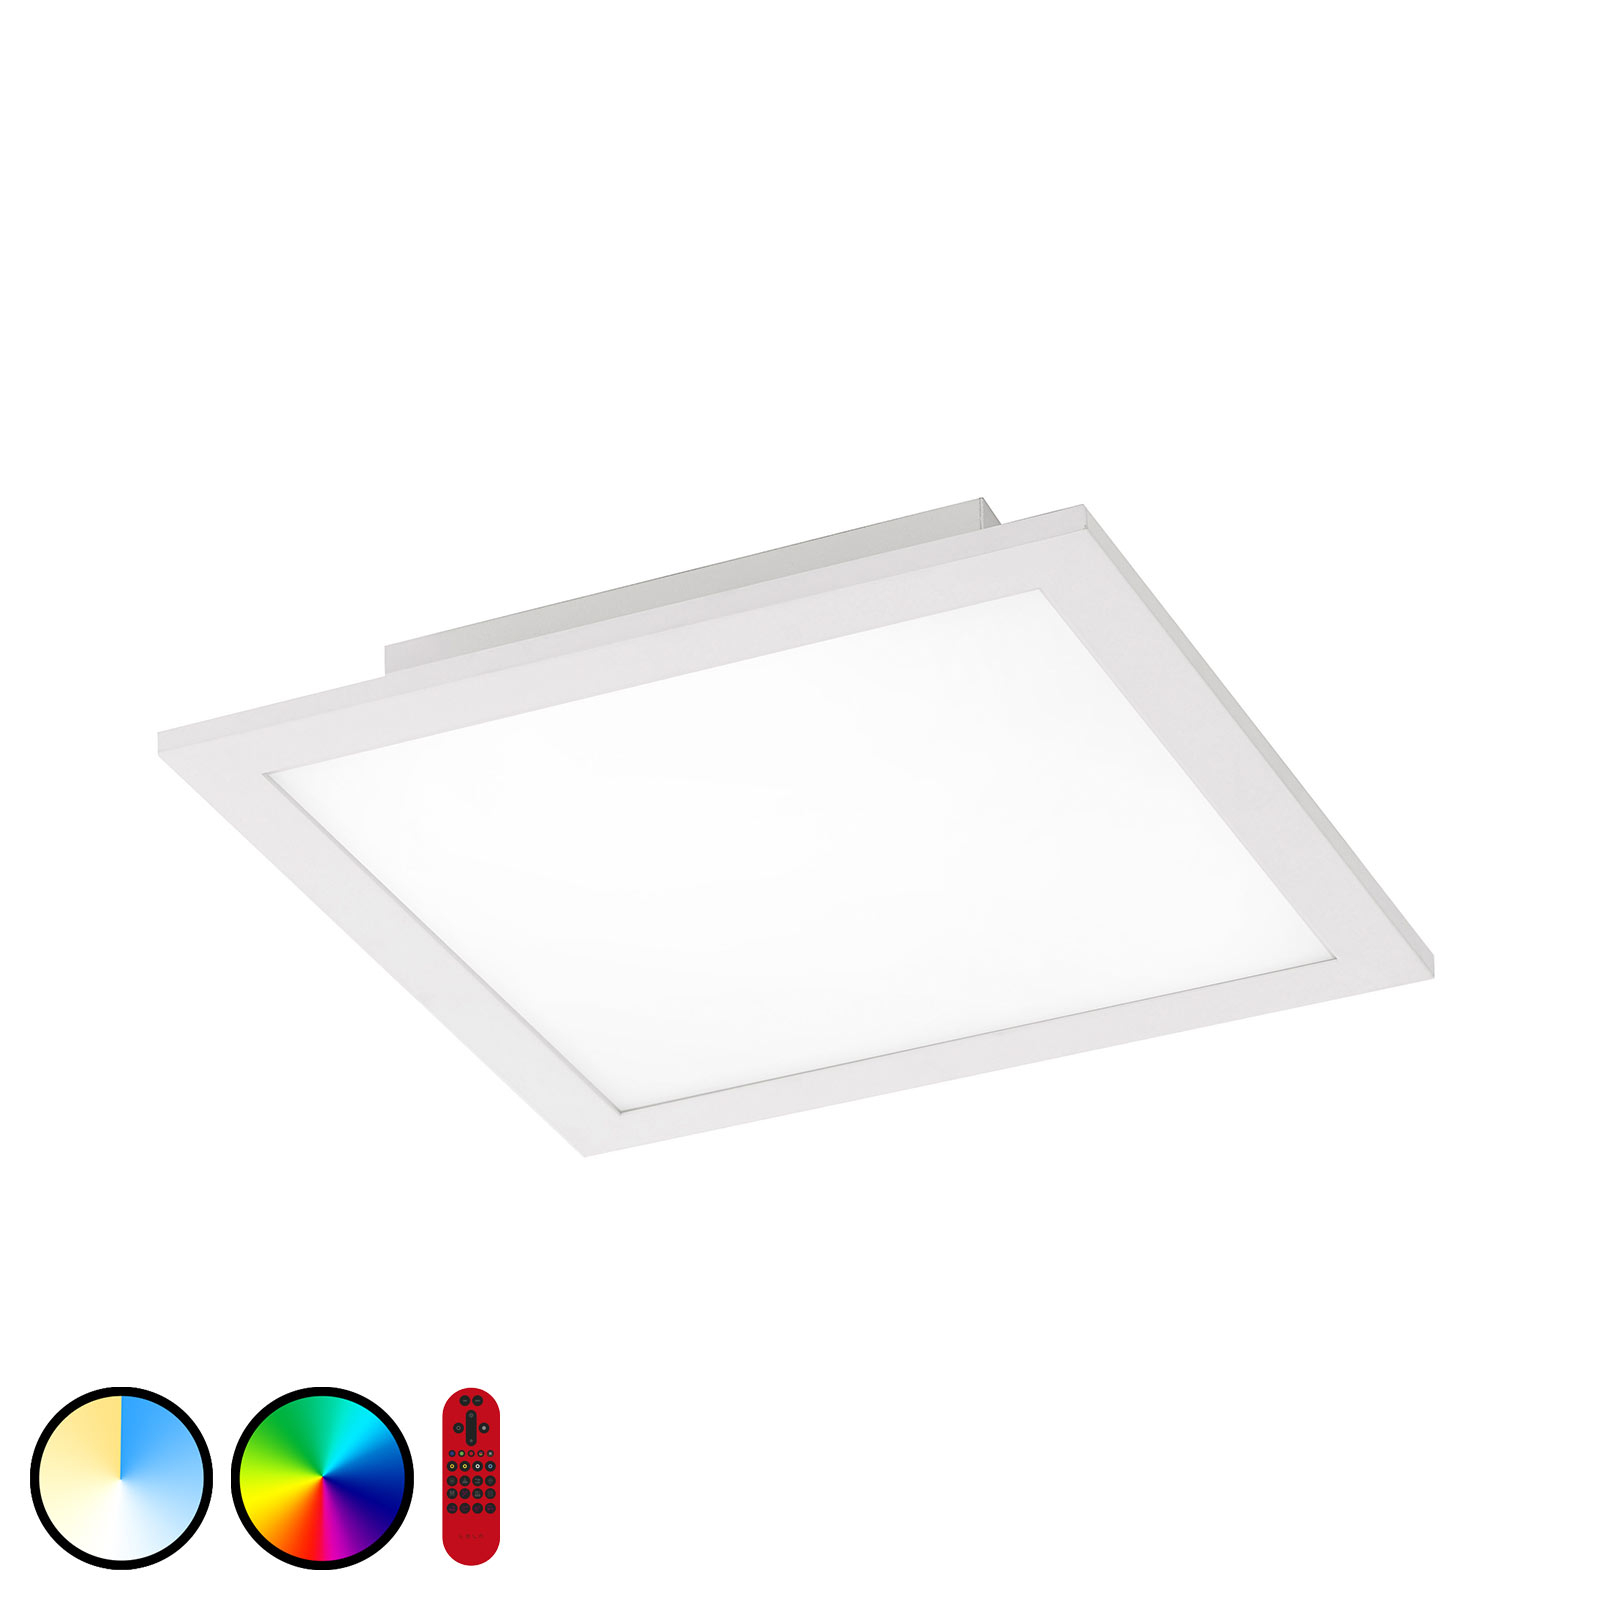 Lampa sufitowa LED LOLAsmart Flat, 30 x 30 cm